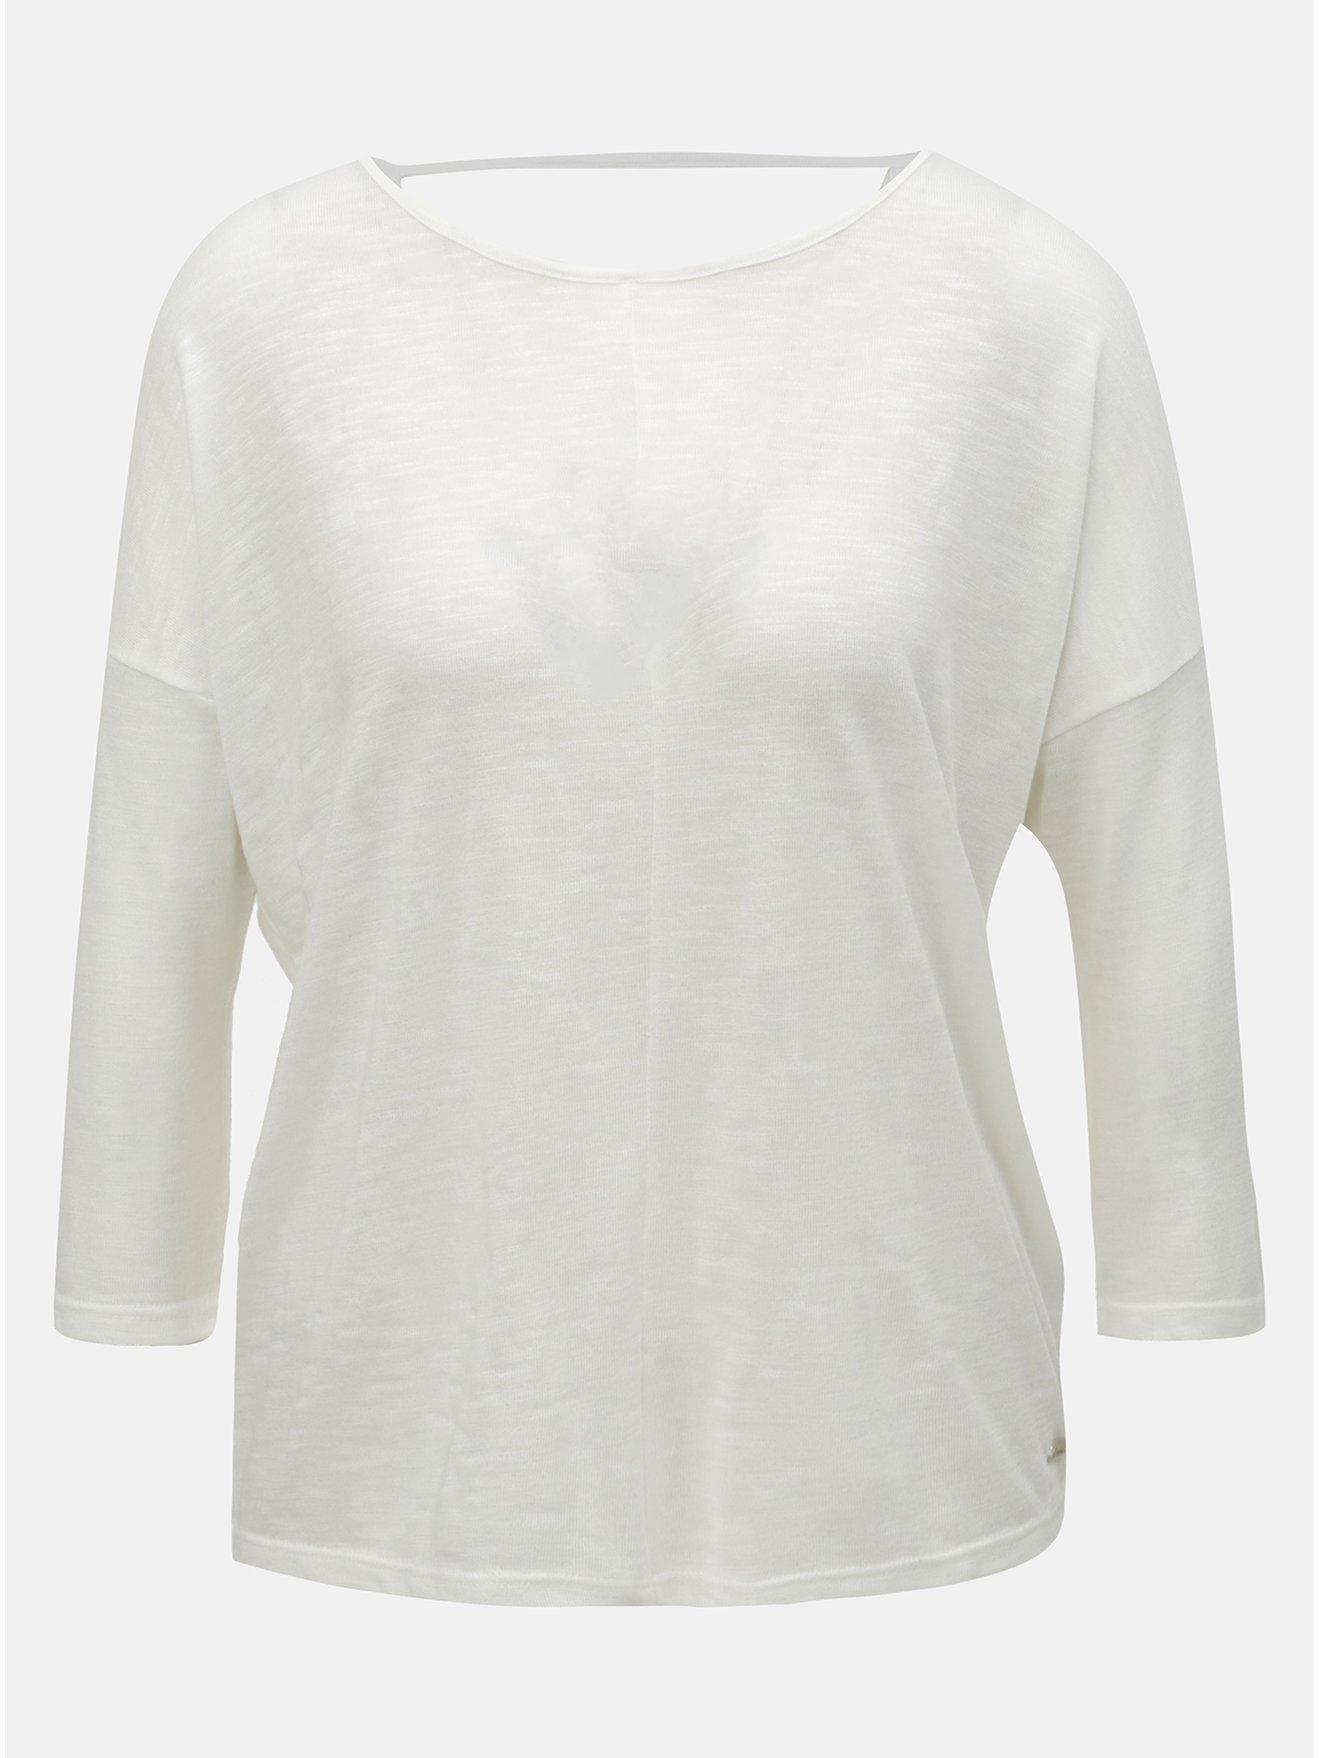 Krémové dámské volné tričko s 3/4 rukávem Tom Tailor Denim